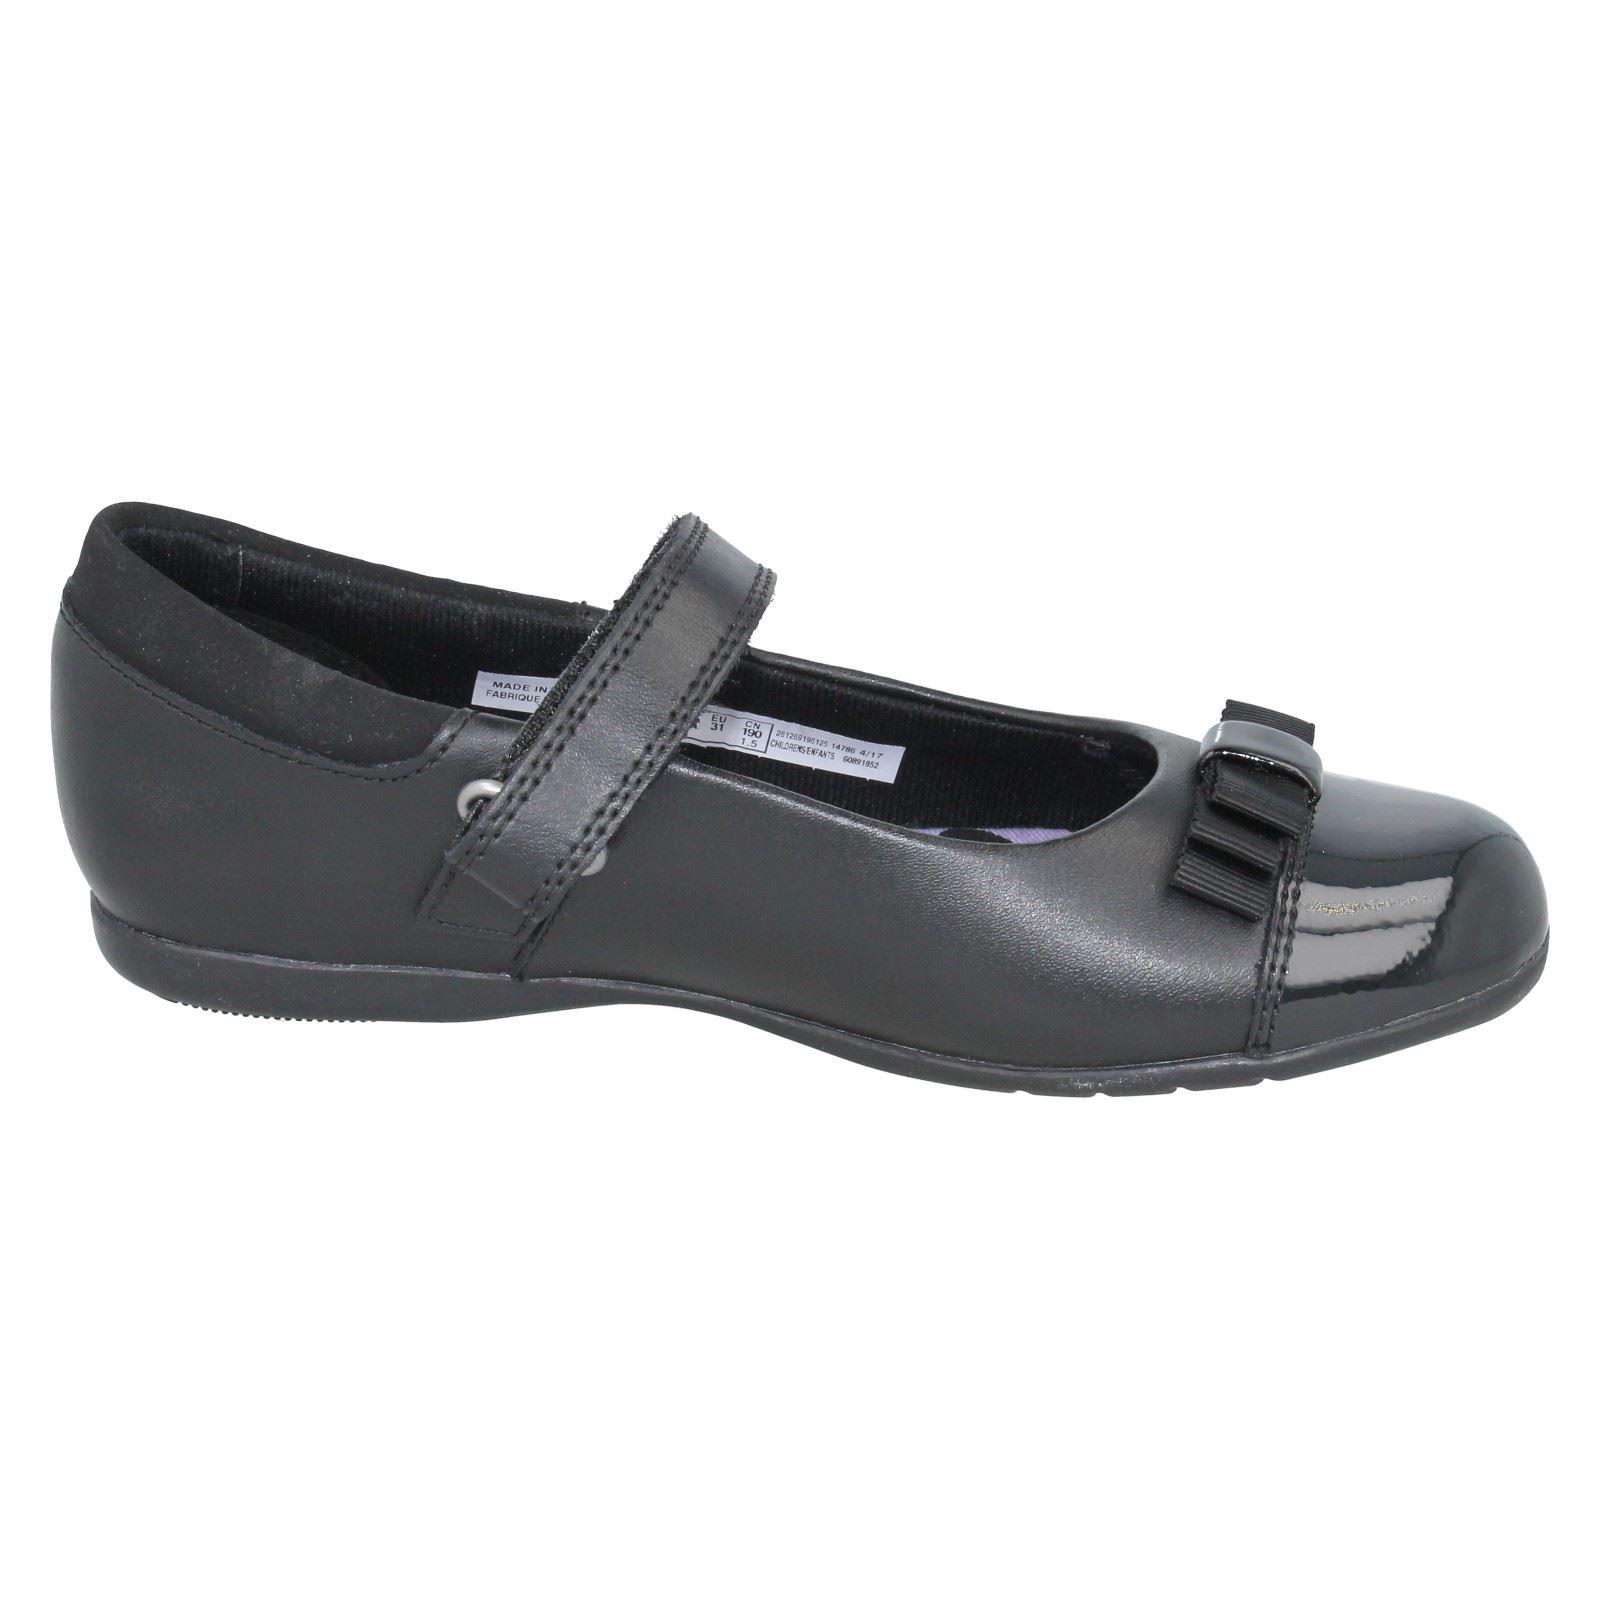 Chicas Clarks Zapatos Escolares Etiqueta-Dance Shout